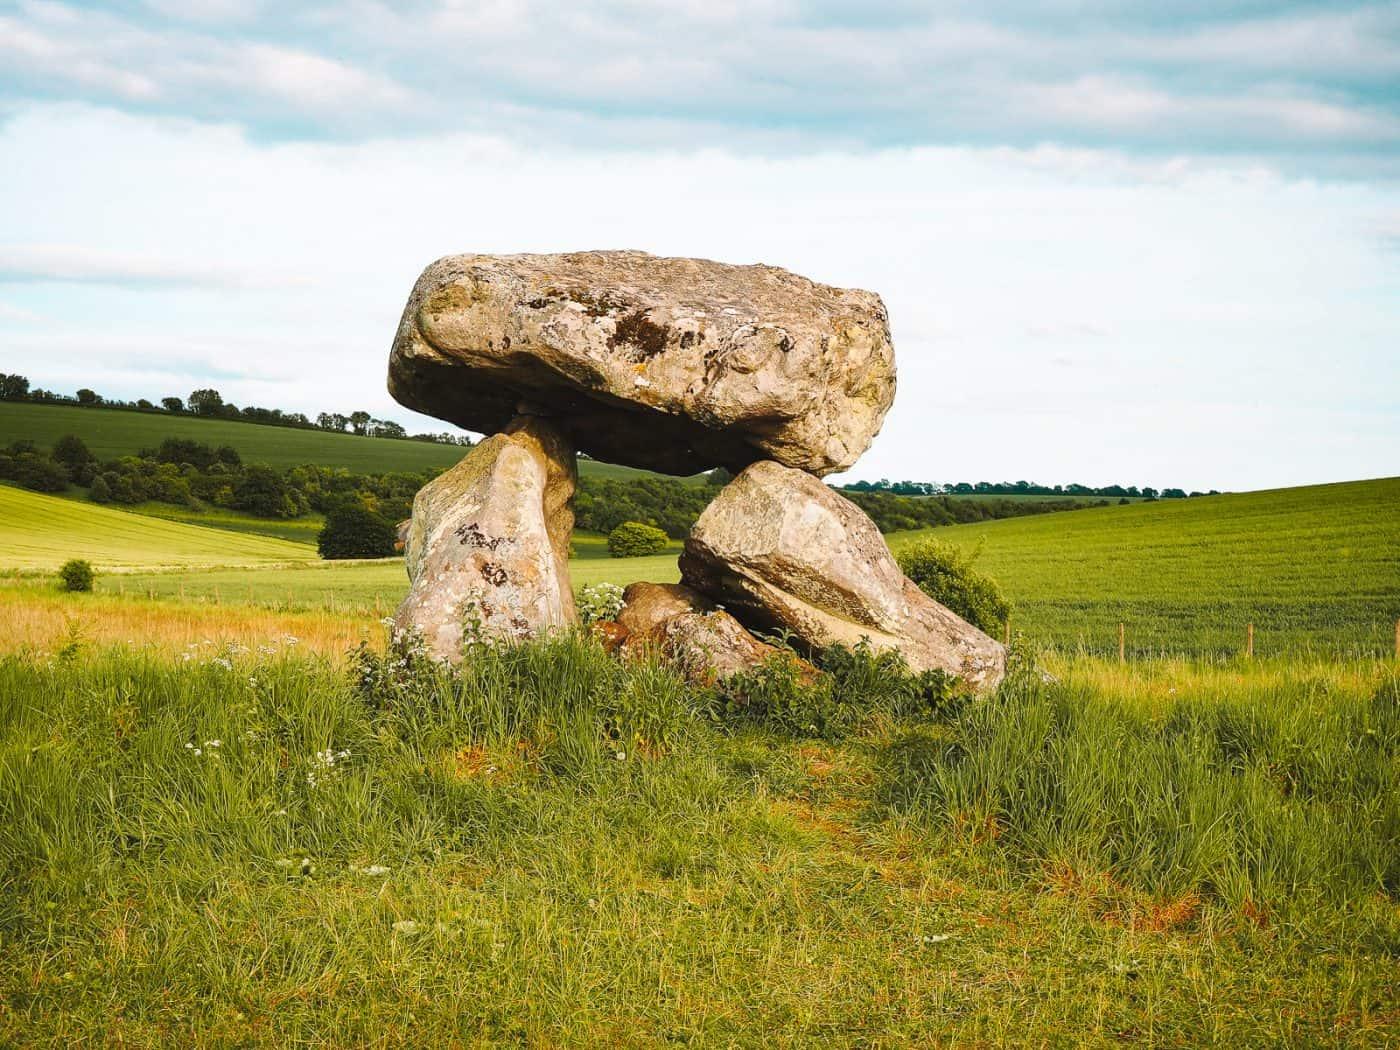 How to Find the Devil's Den on Fyfield Down Avebury dolmen chamber